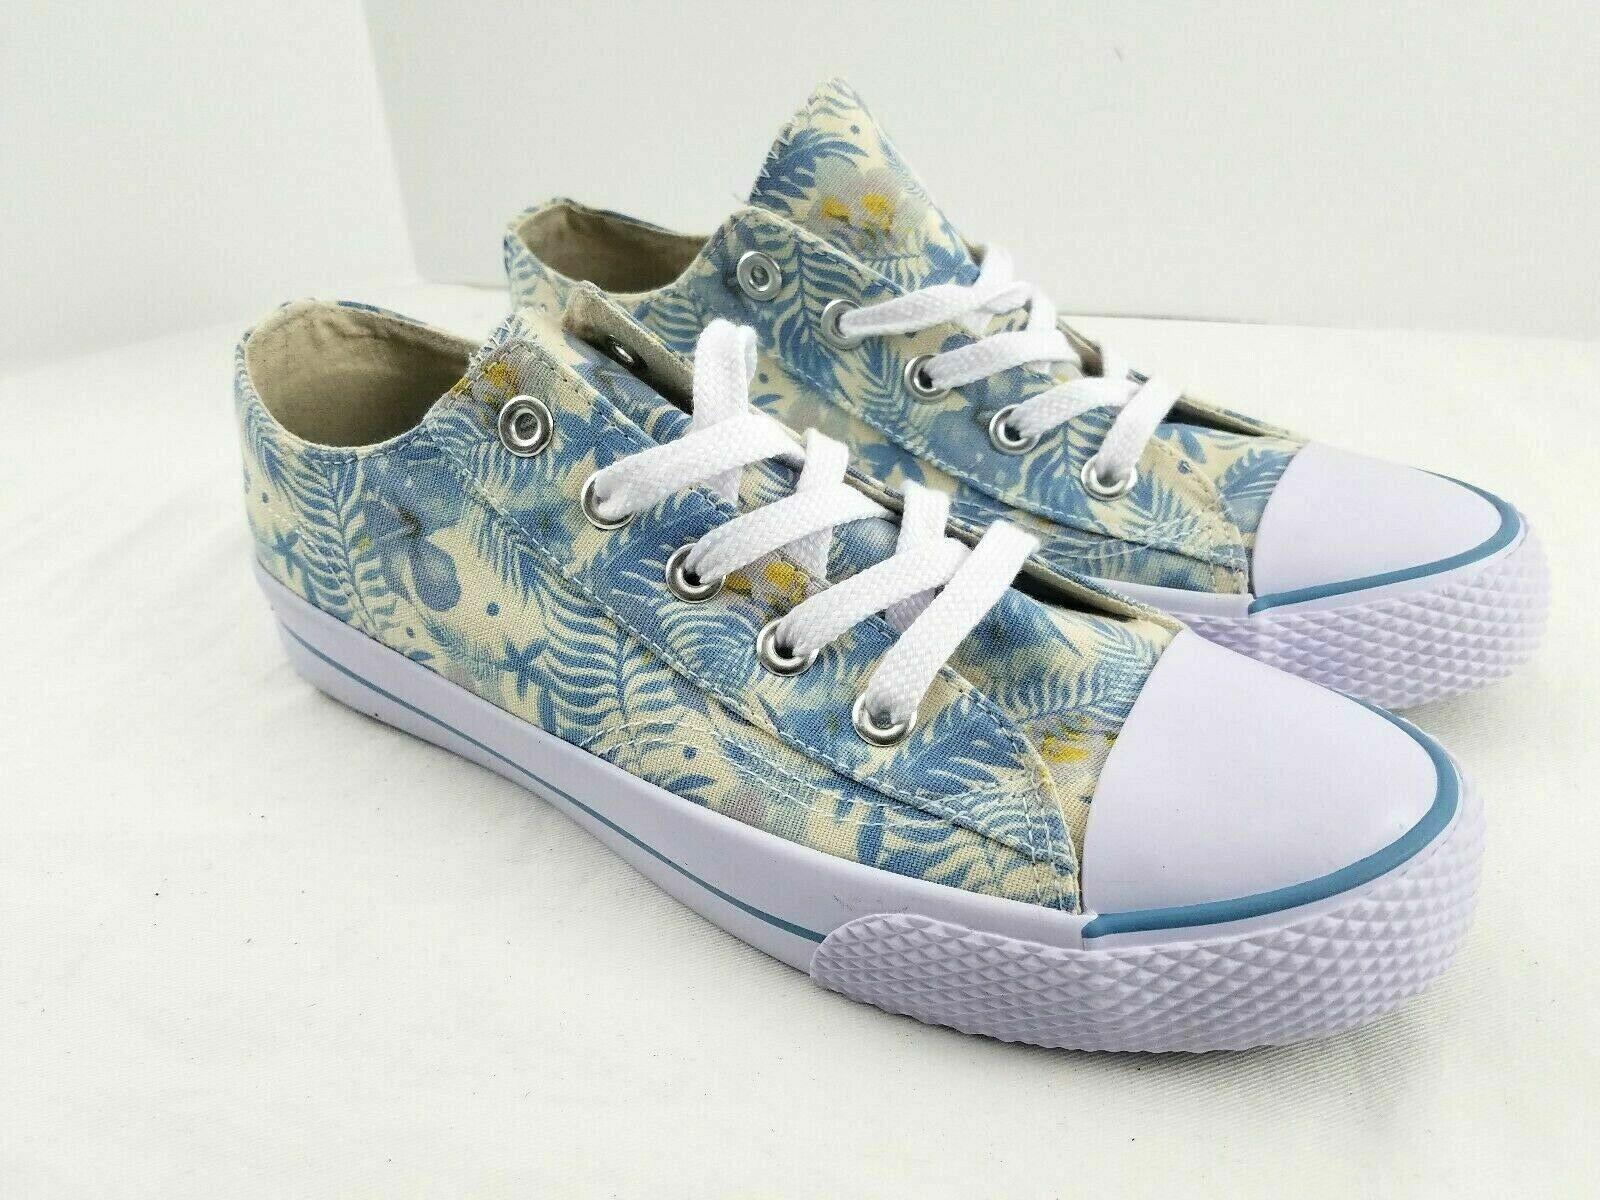 Airwalk Sneaker Floral Canvas Shoe Non Marking Low Top Women